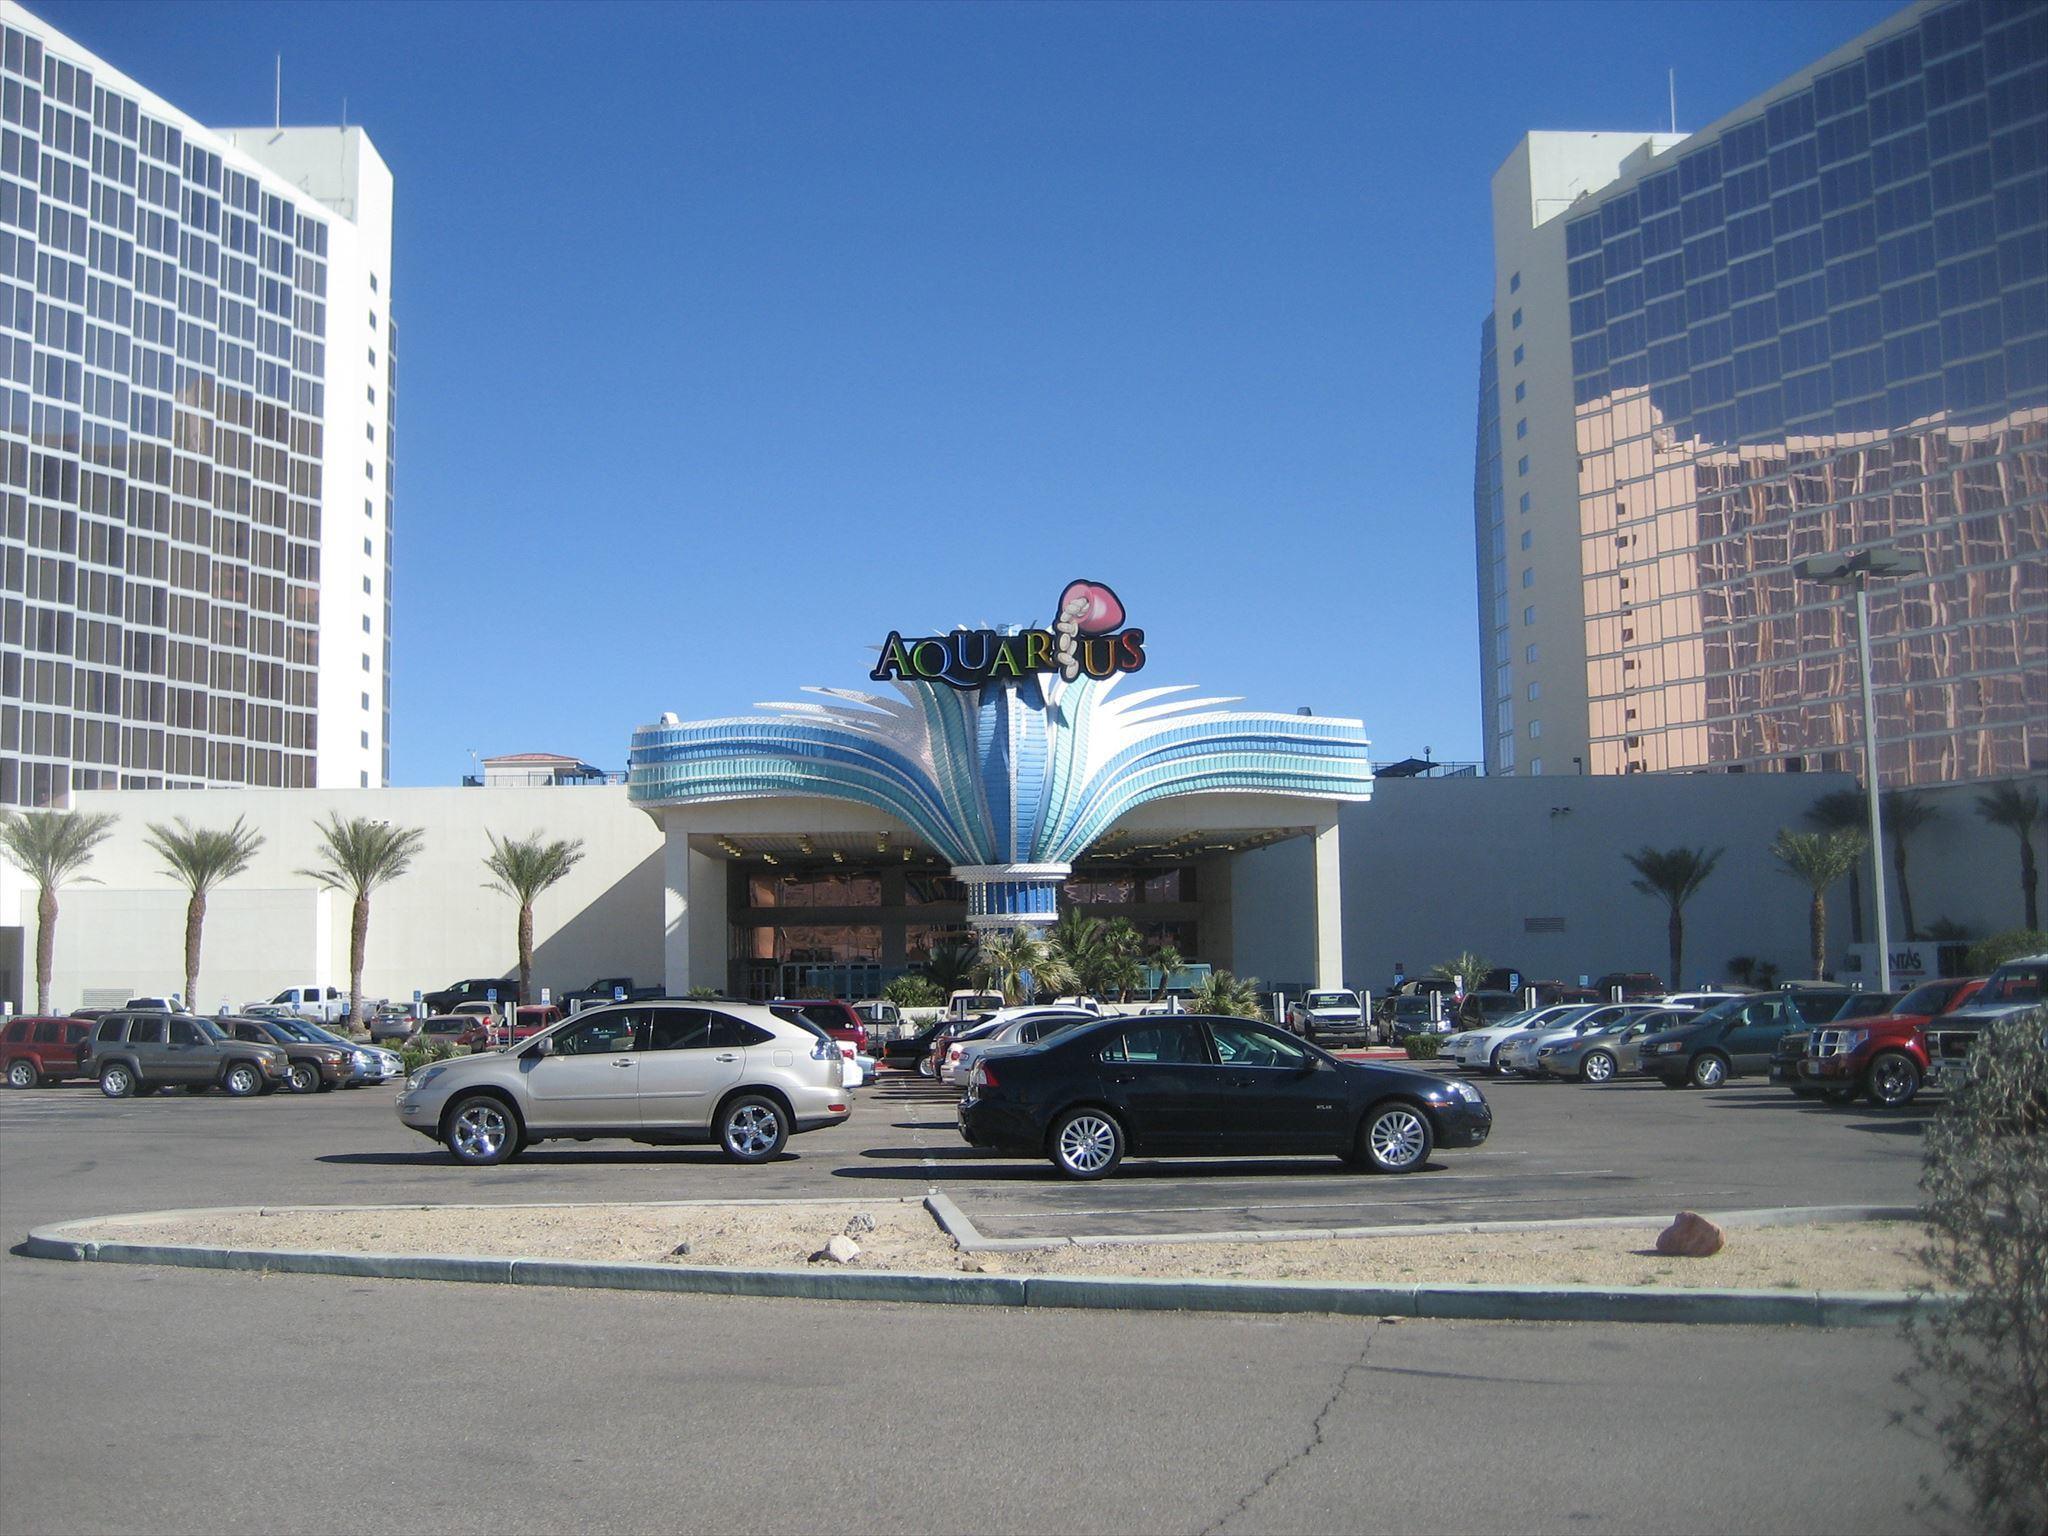 Aquarius casino resort in laughlin nv